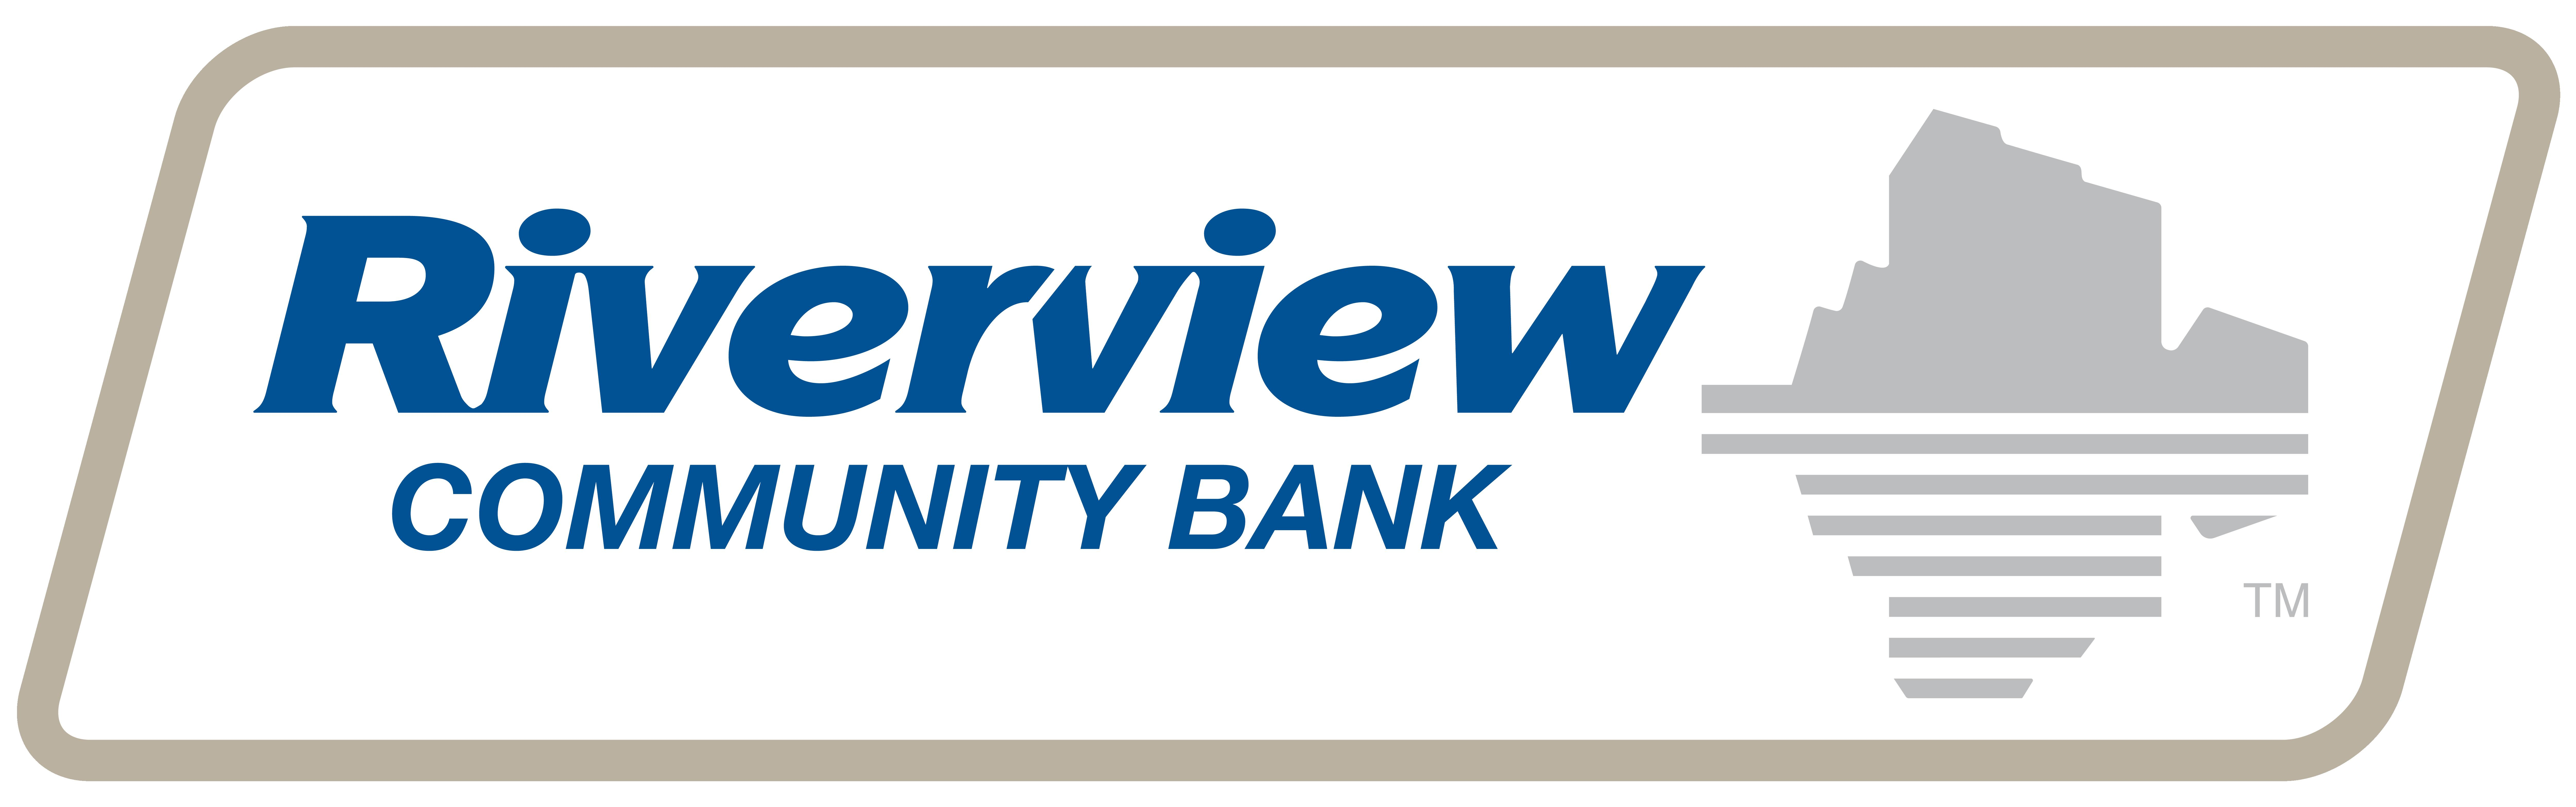 riverview-community-bank-logo-2020-01